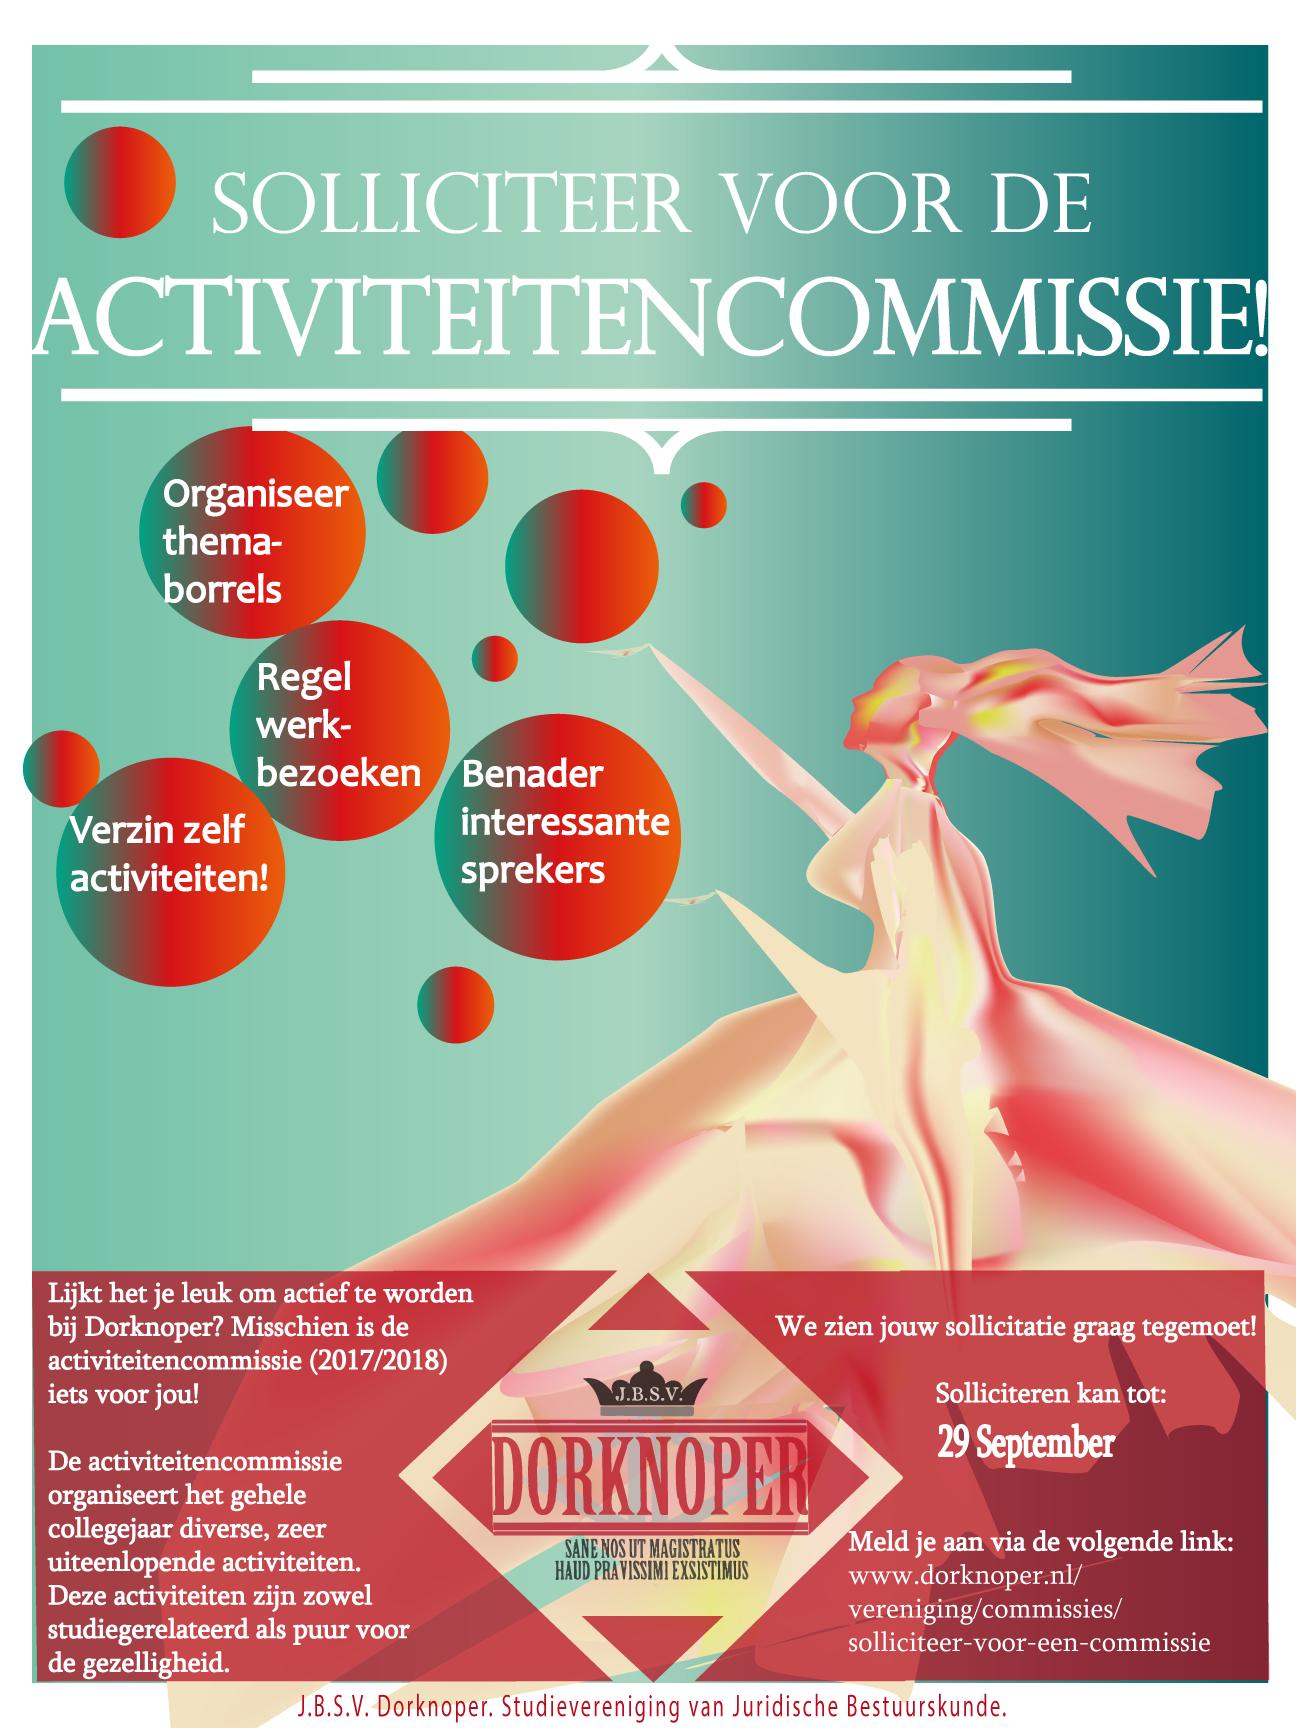 Dorknoper zoekt activiteitencommissie 2017/2018